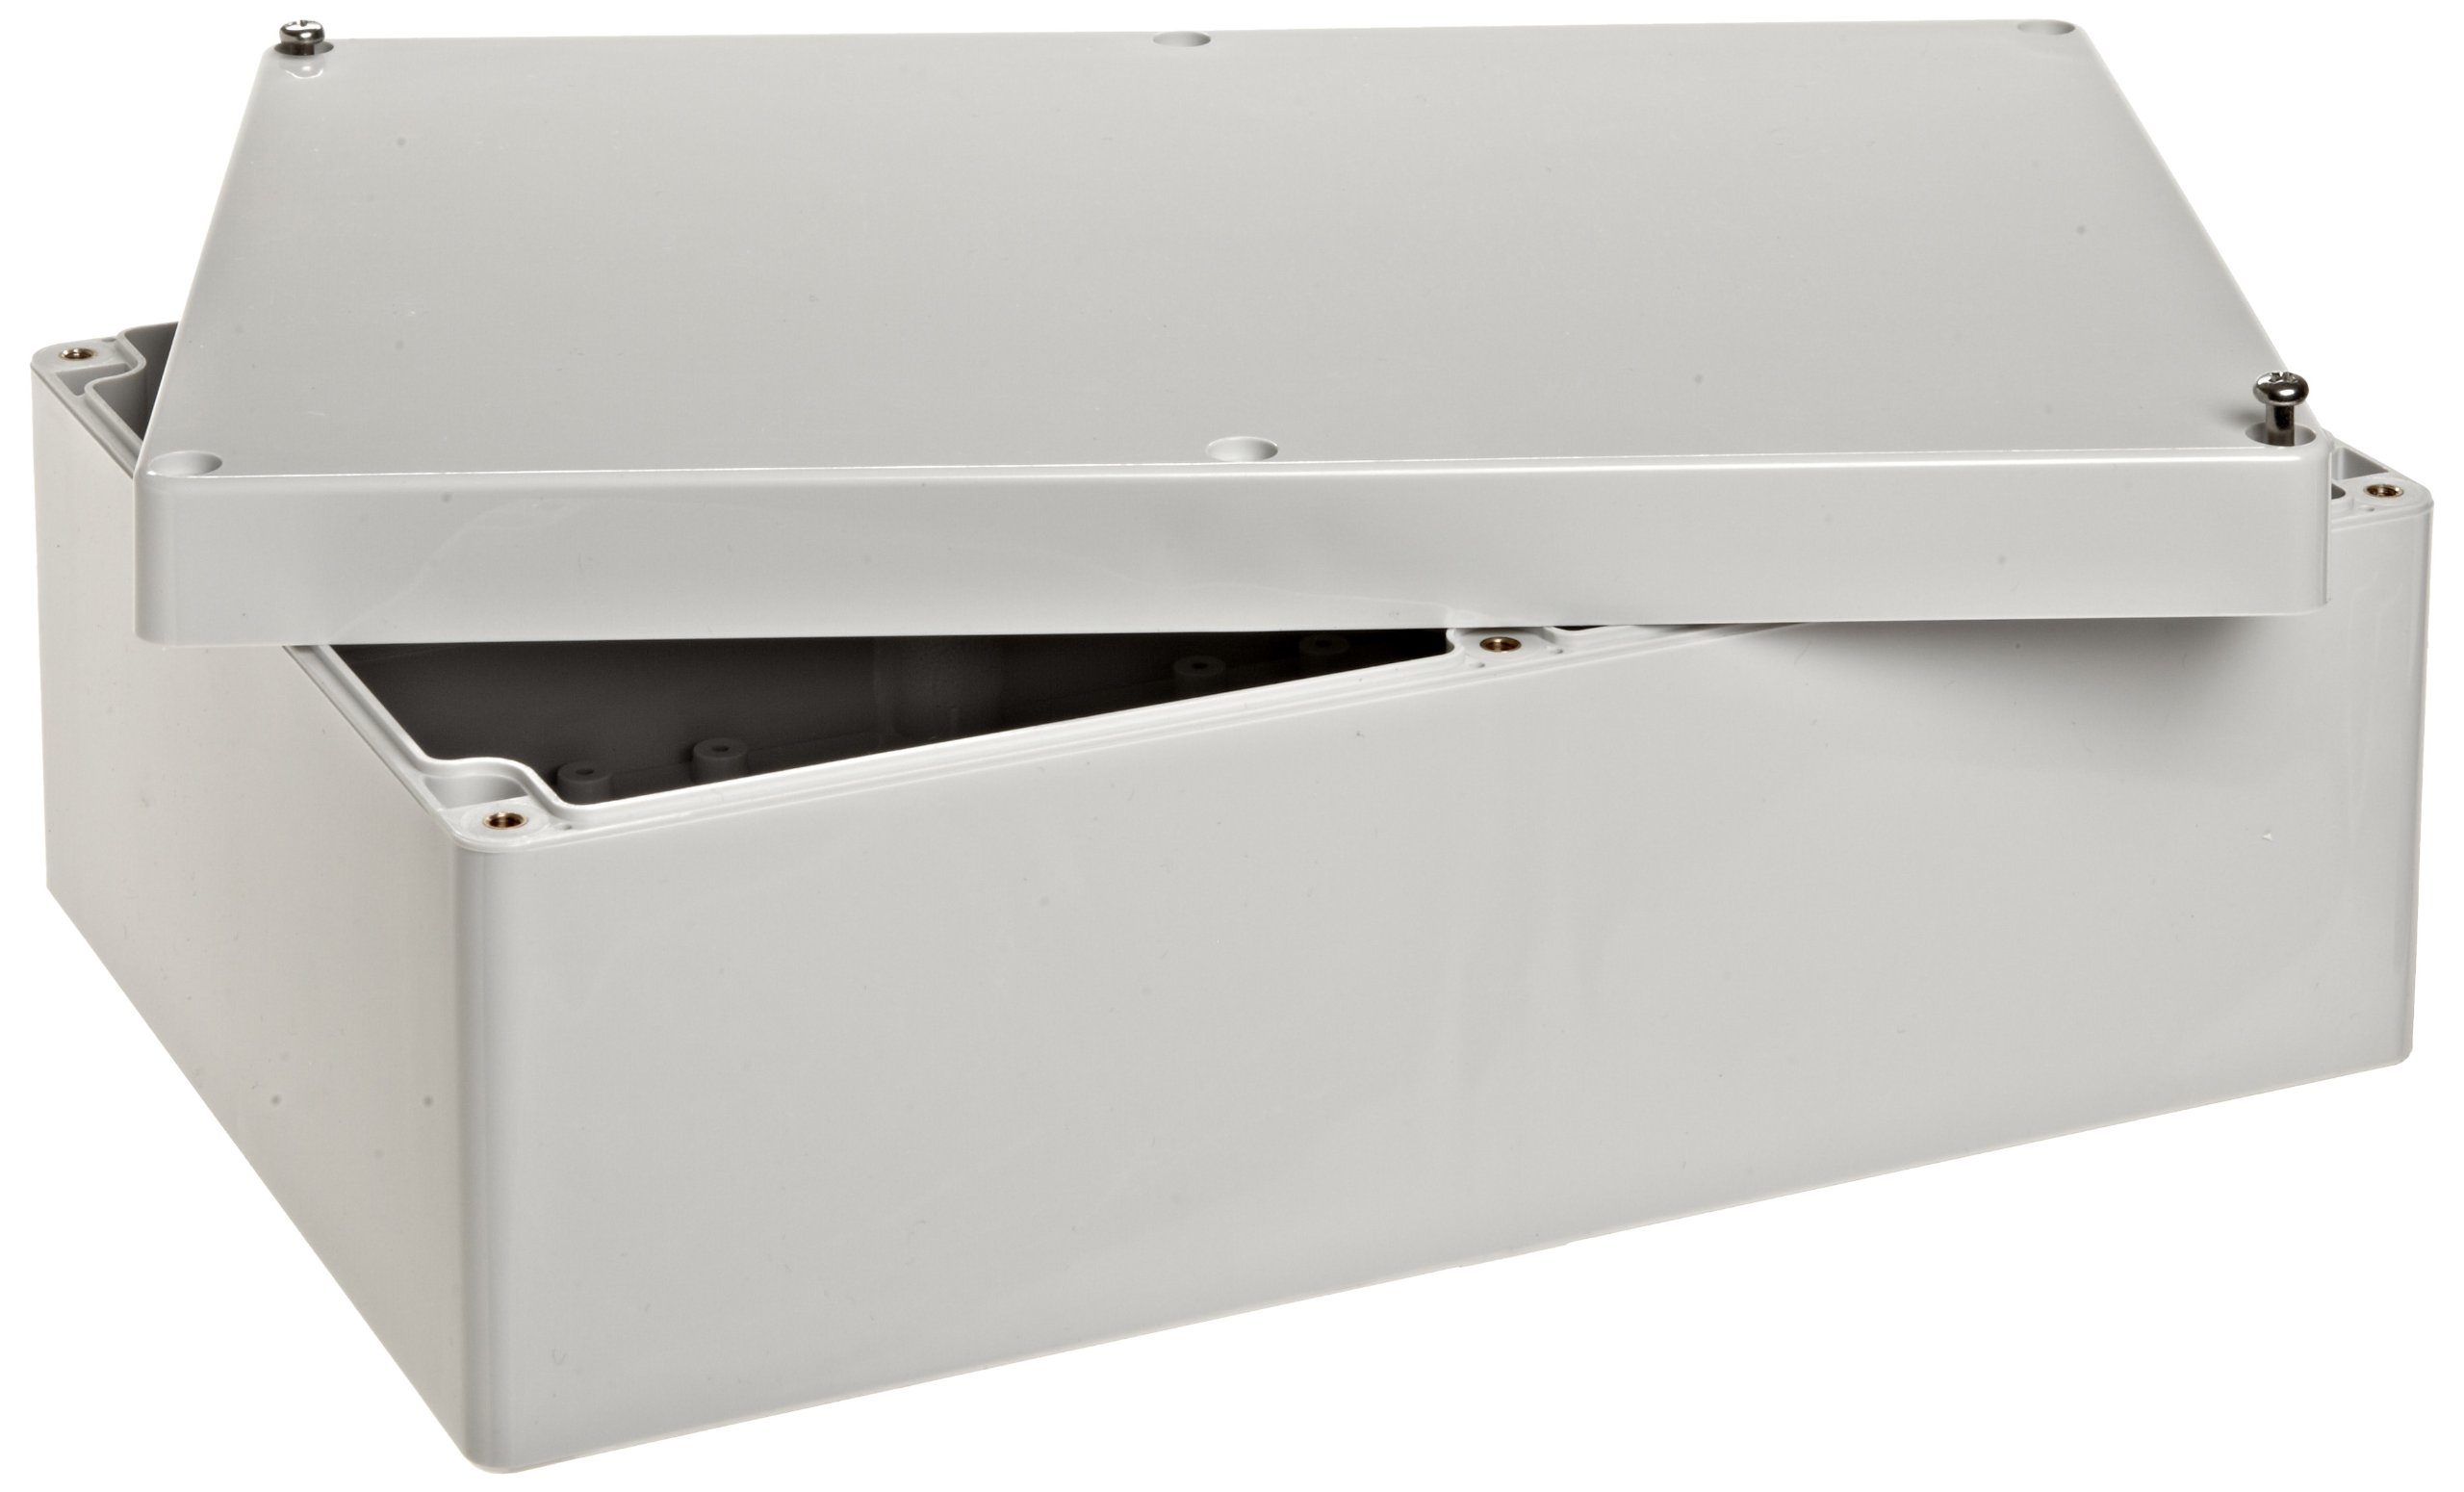 BUD Industries PN-1335-DG High-Impact ABS NEMA 4x Indoor Box Dark Gray Finish 10-27//64 Length x 7-17//64 Width x 3-47//64 Height 10-27//64 Length x 7-17//64 Width x 3-47//64 Height